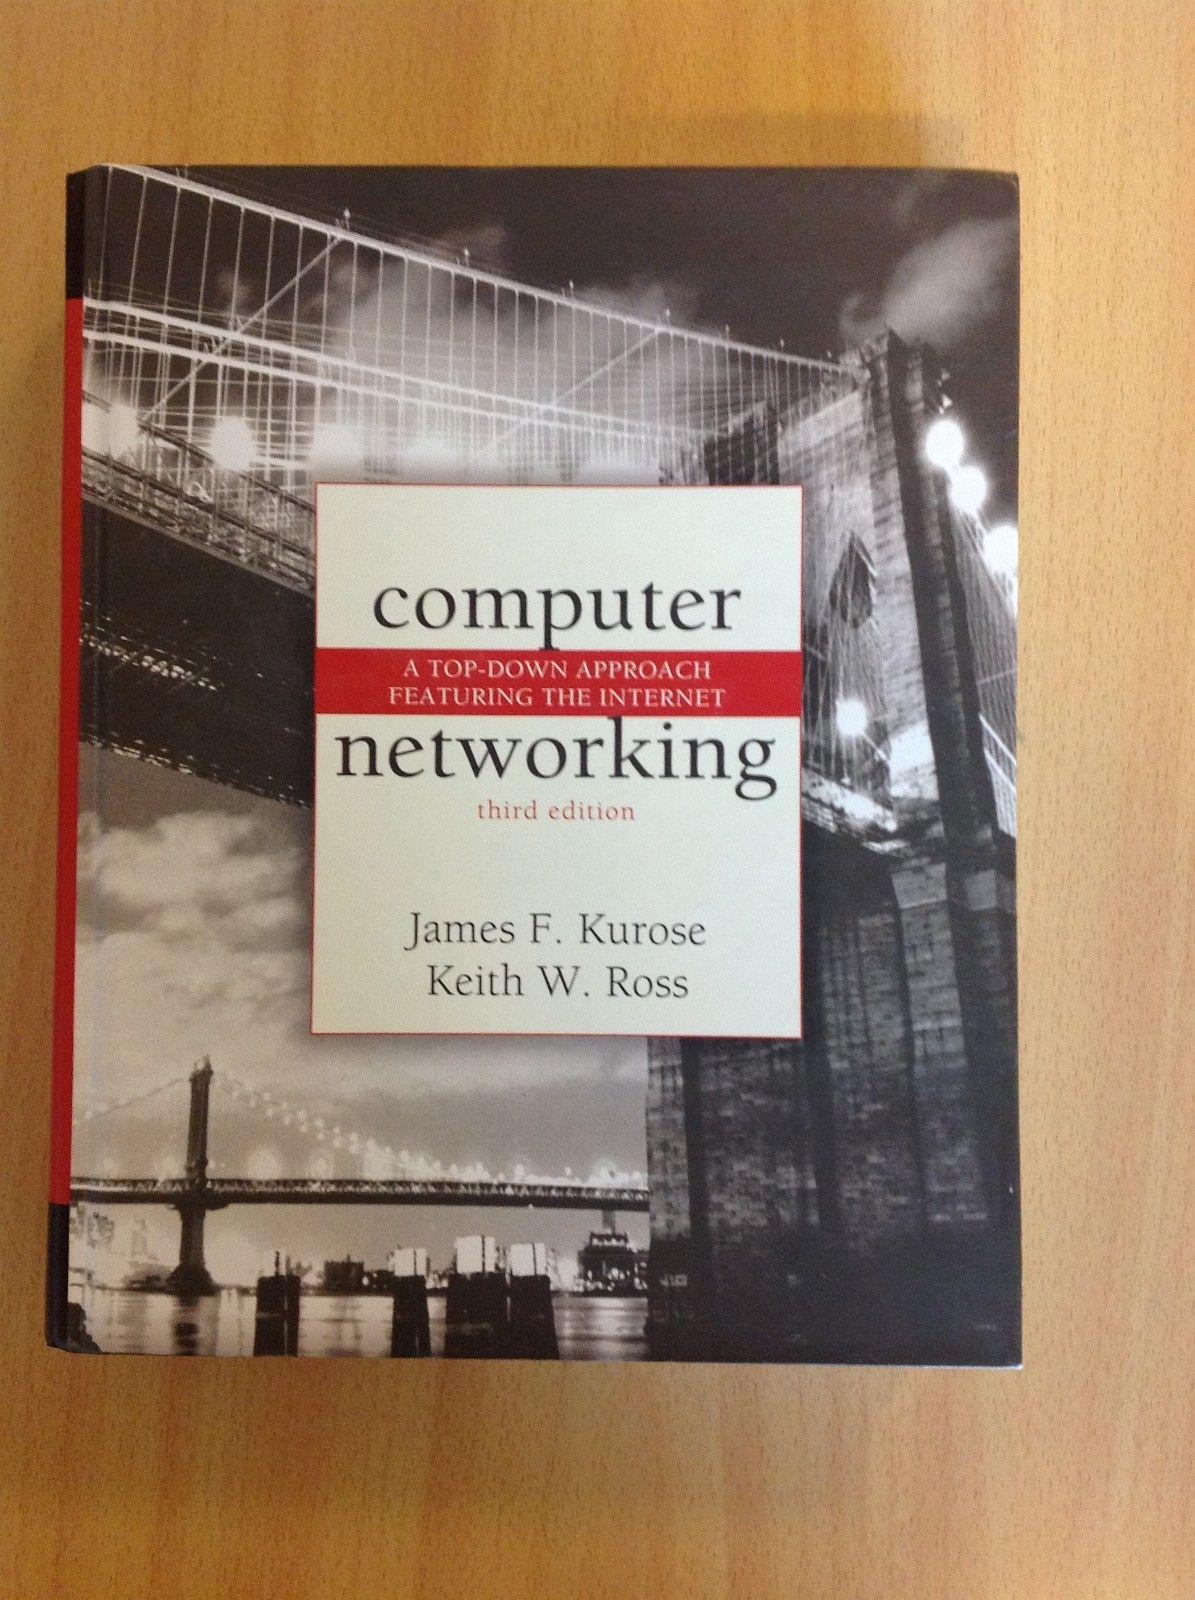 Computer Networking 300kr - Oslo  - Computer Networking Keith W. Ross, James F. Kurose Forlag: Addison Wesley ISBN: 9780321227355 Utgitt: 2005 - Oslo